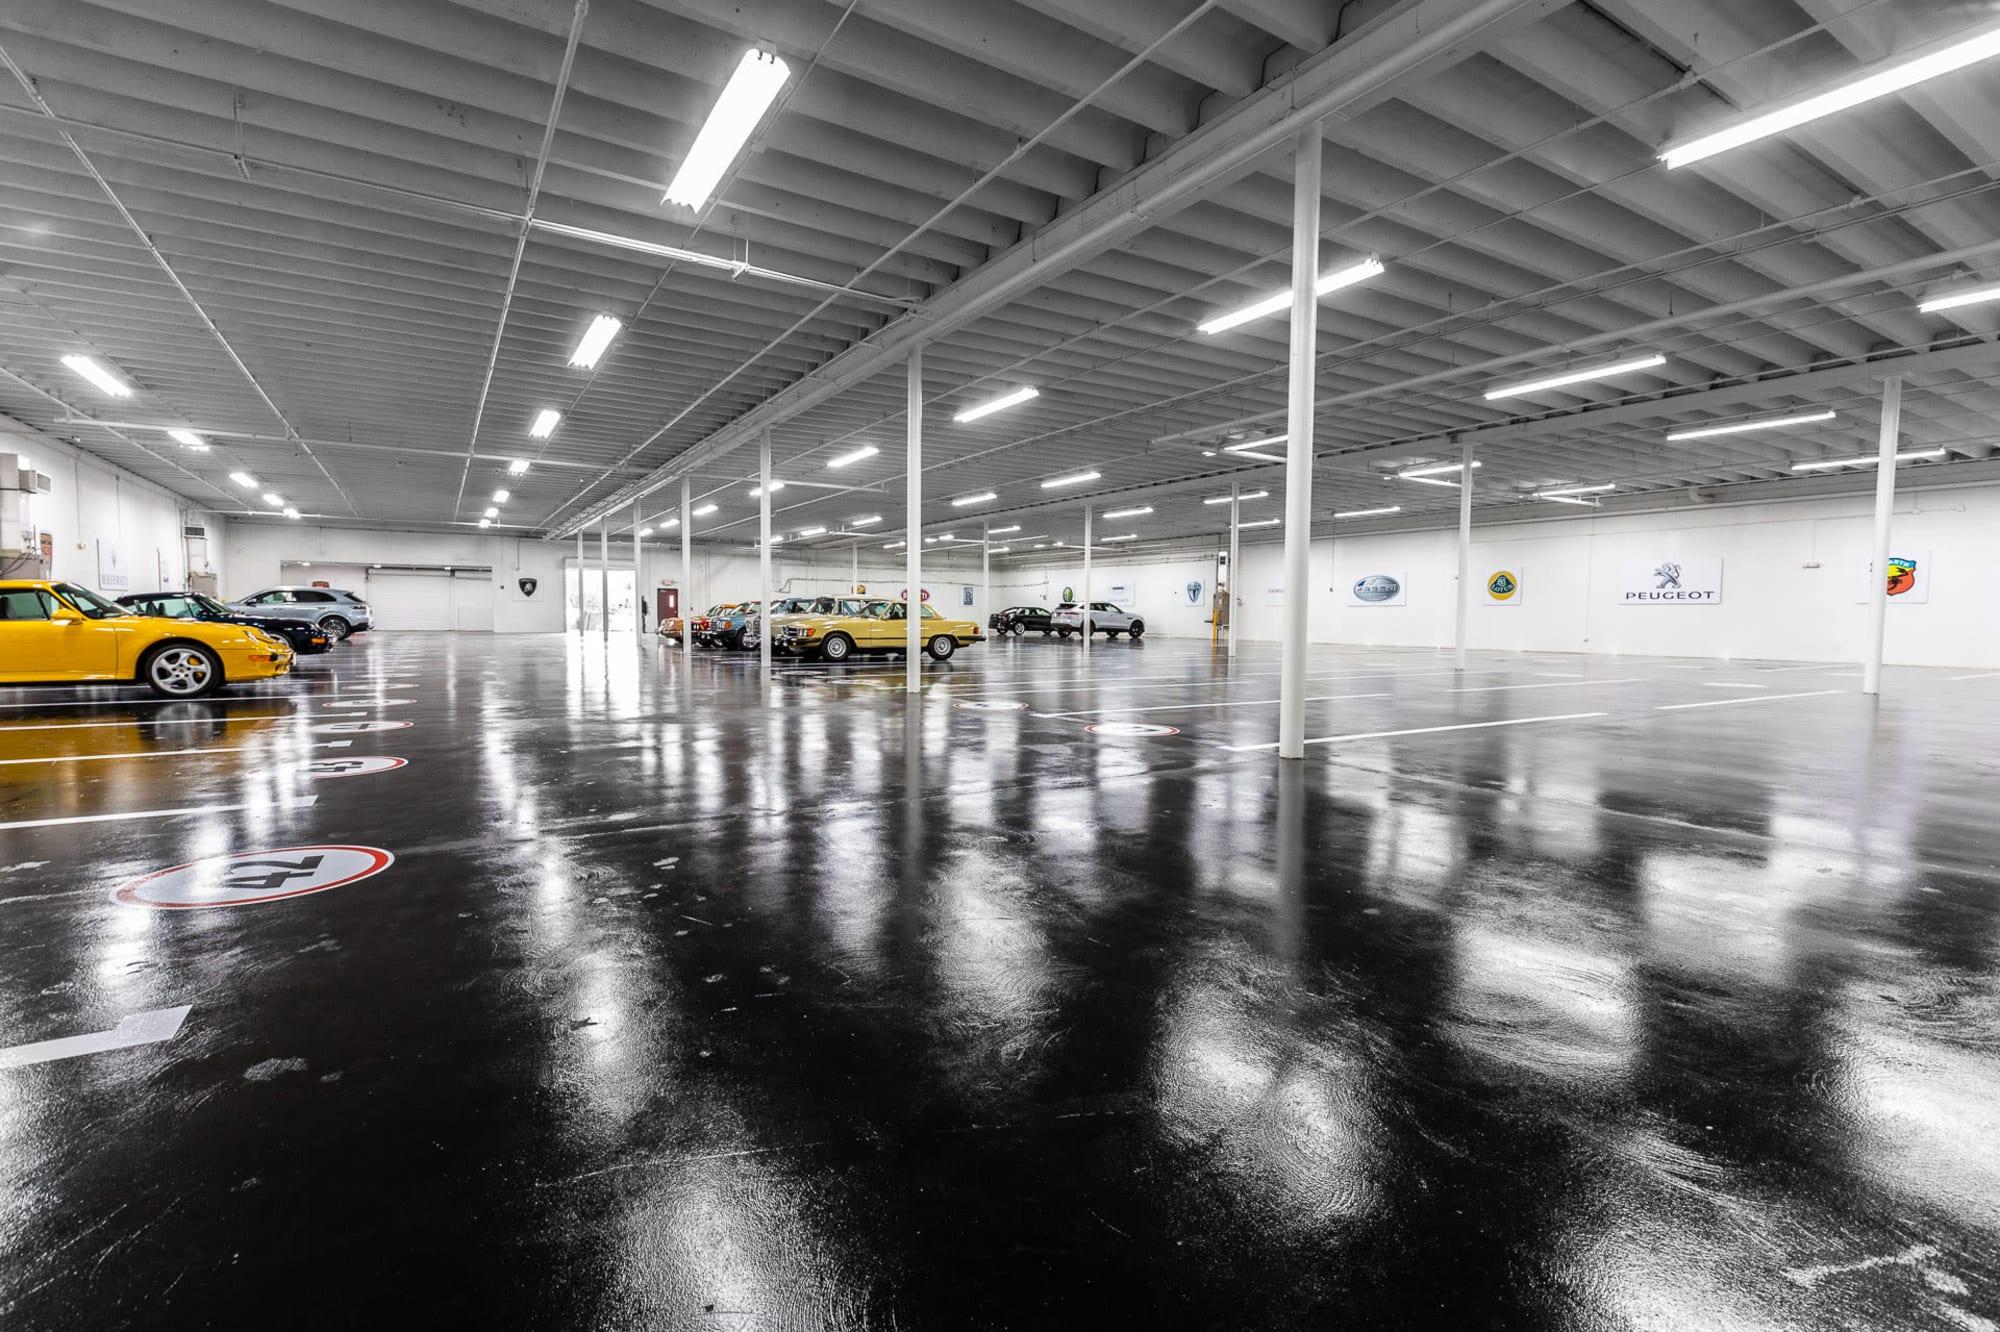 The very spacious garage at Premier Car Storage in Miami, Florida